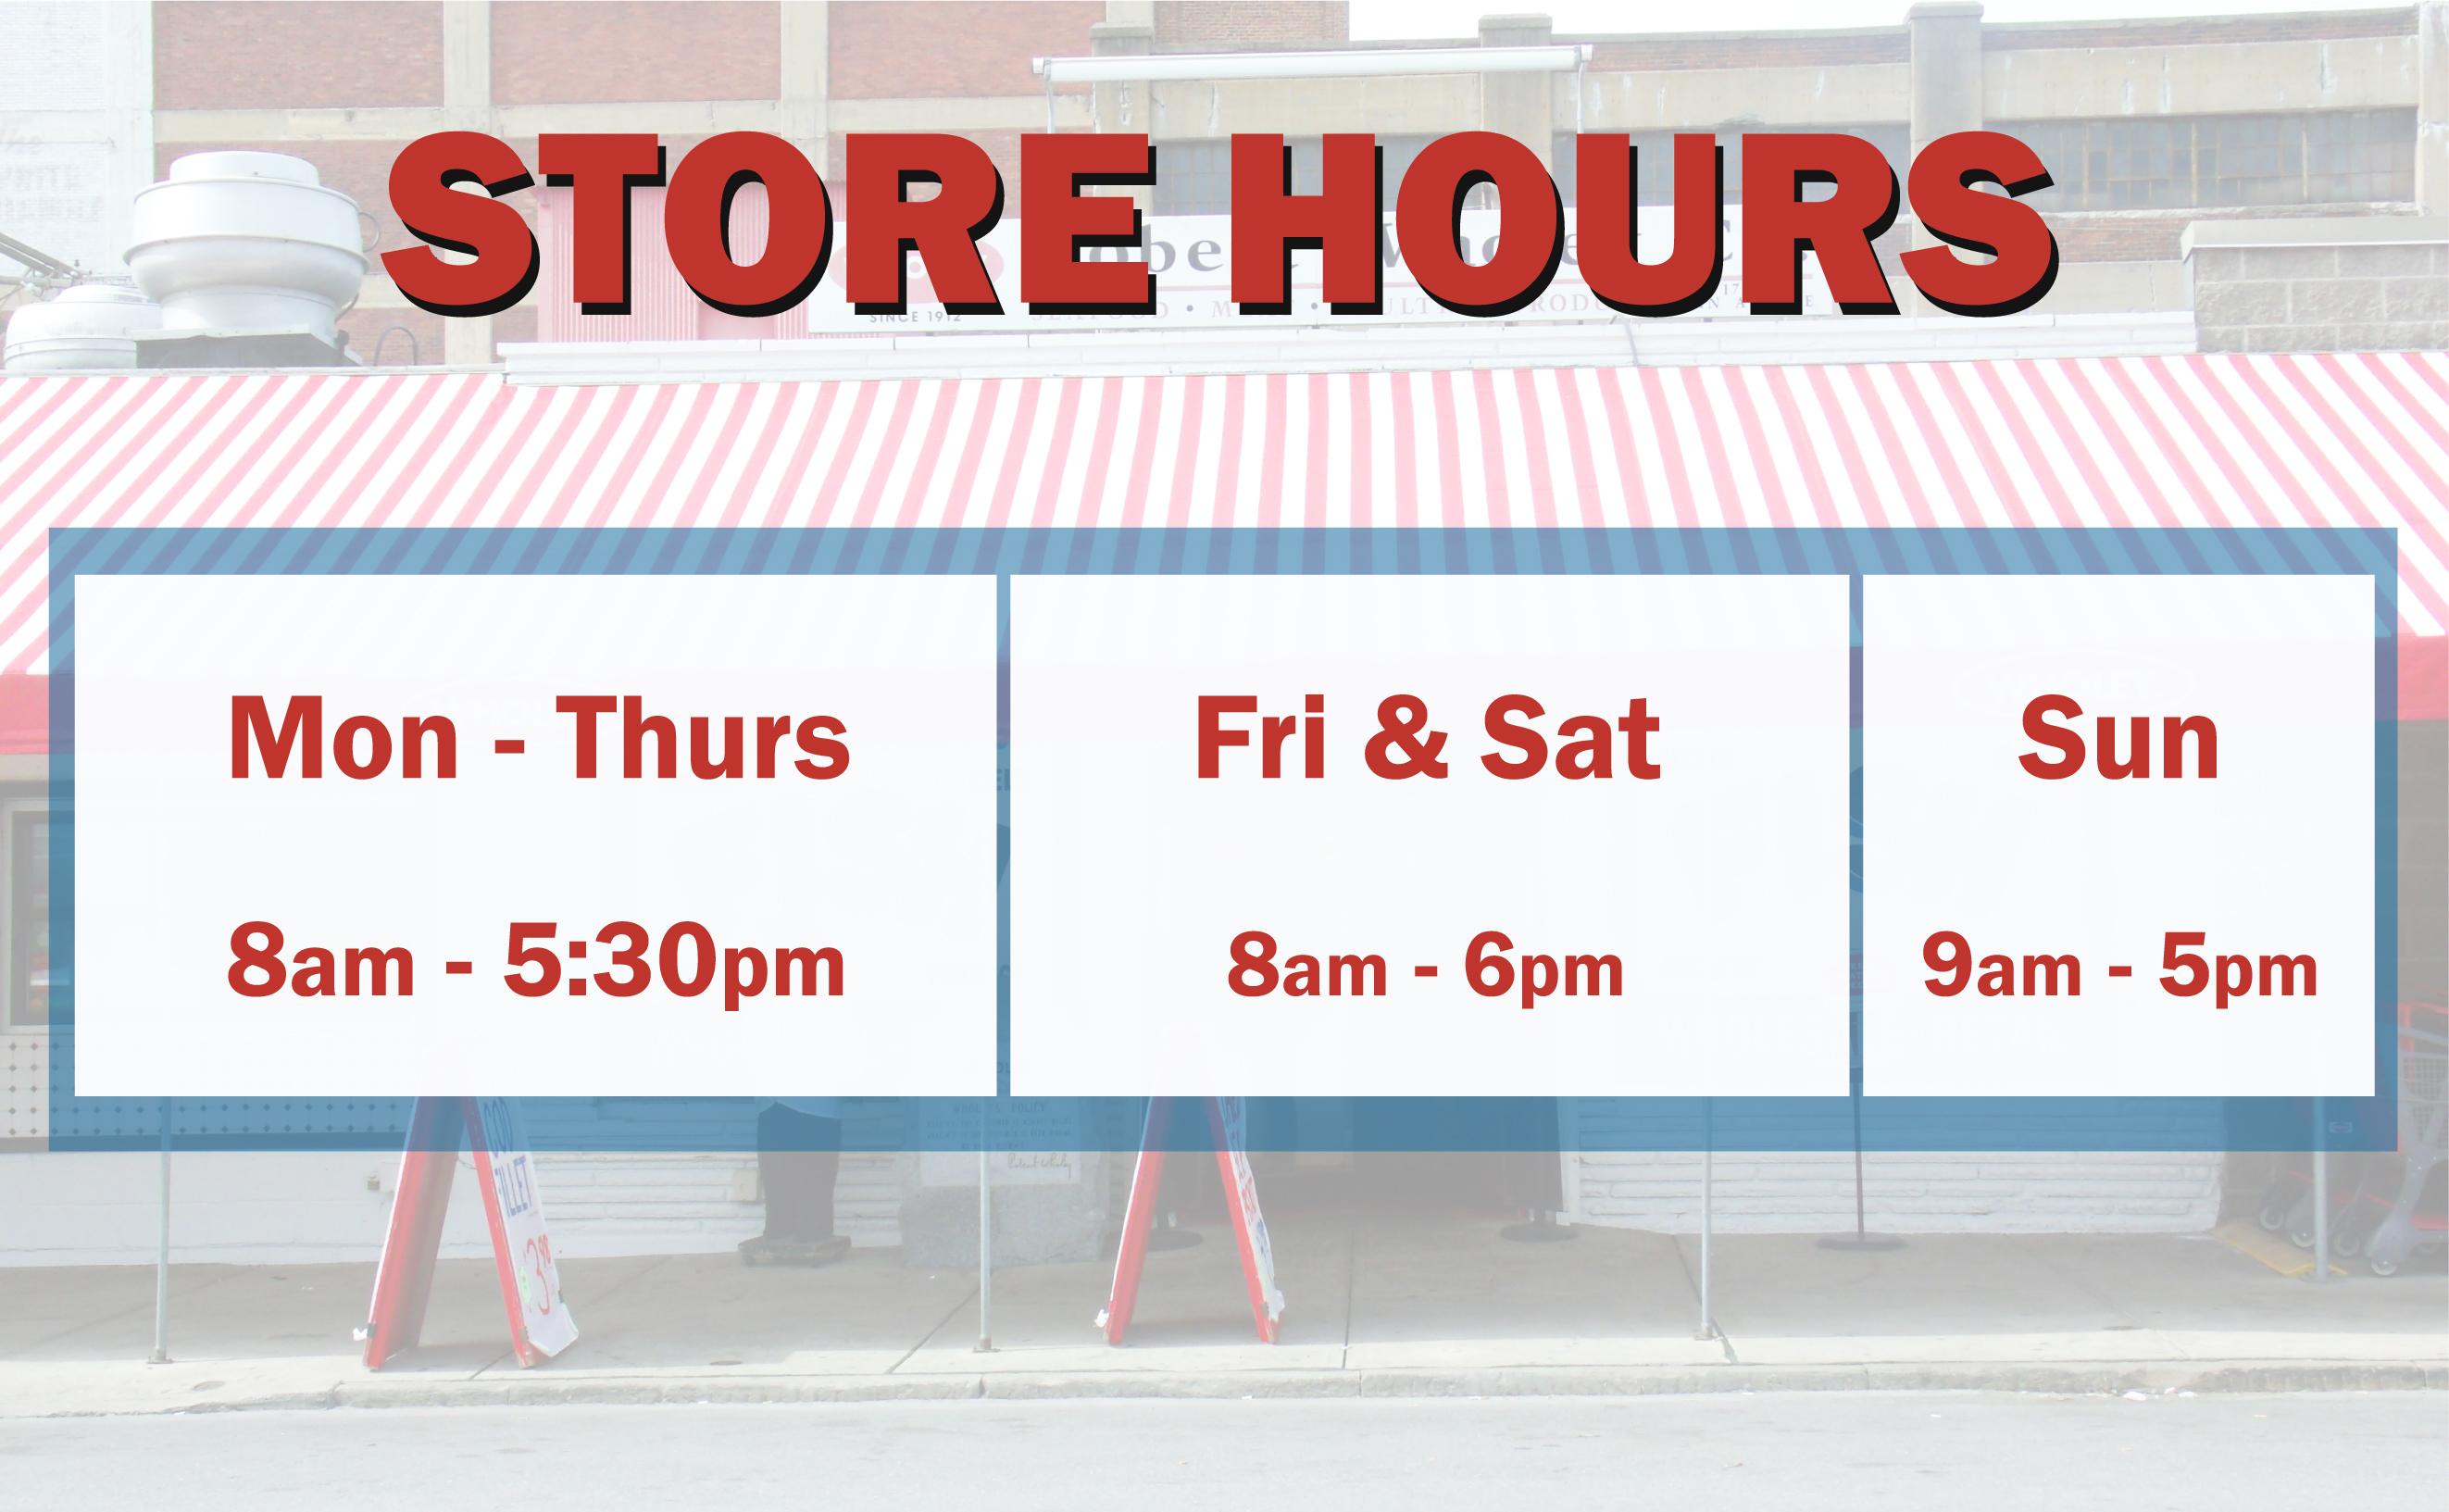 store-hoursnew.jpg